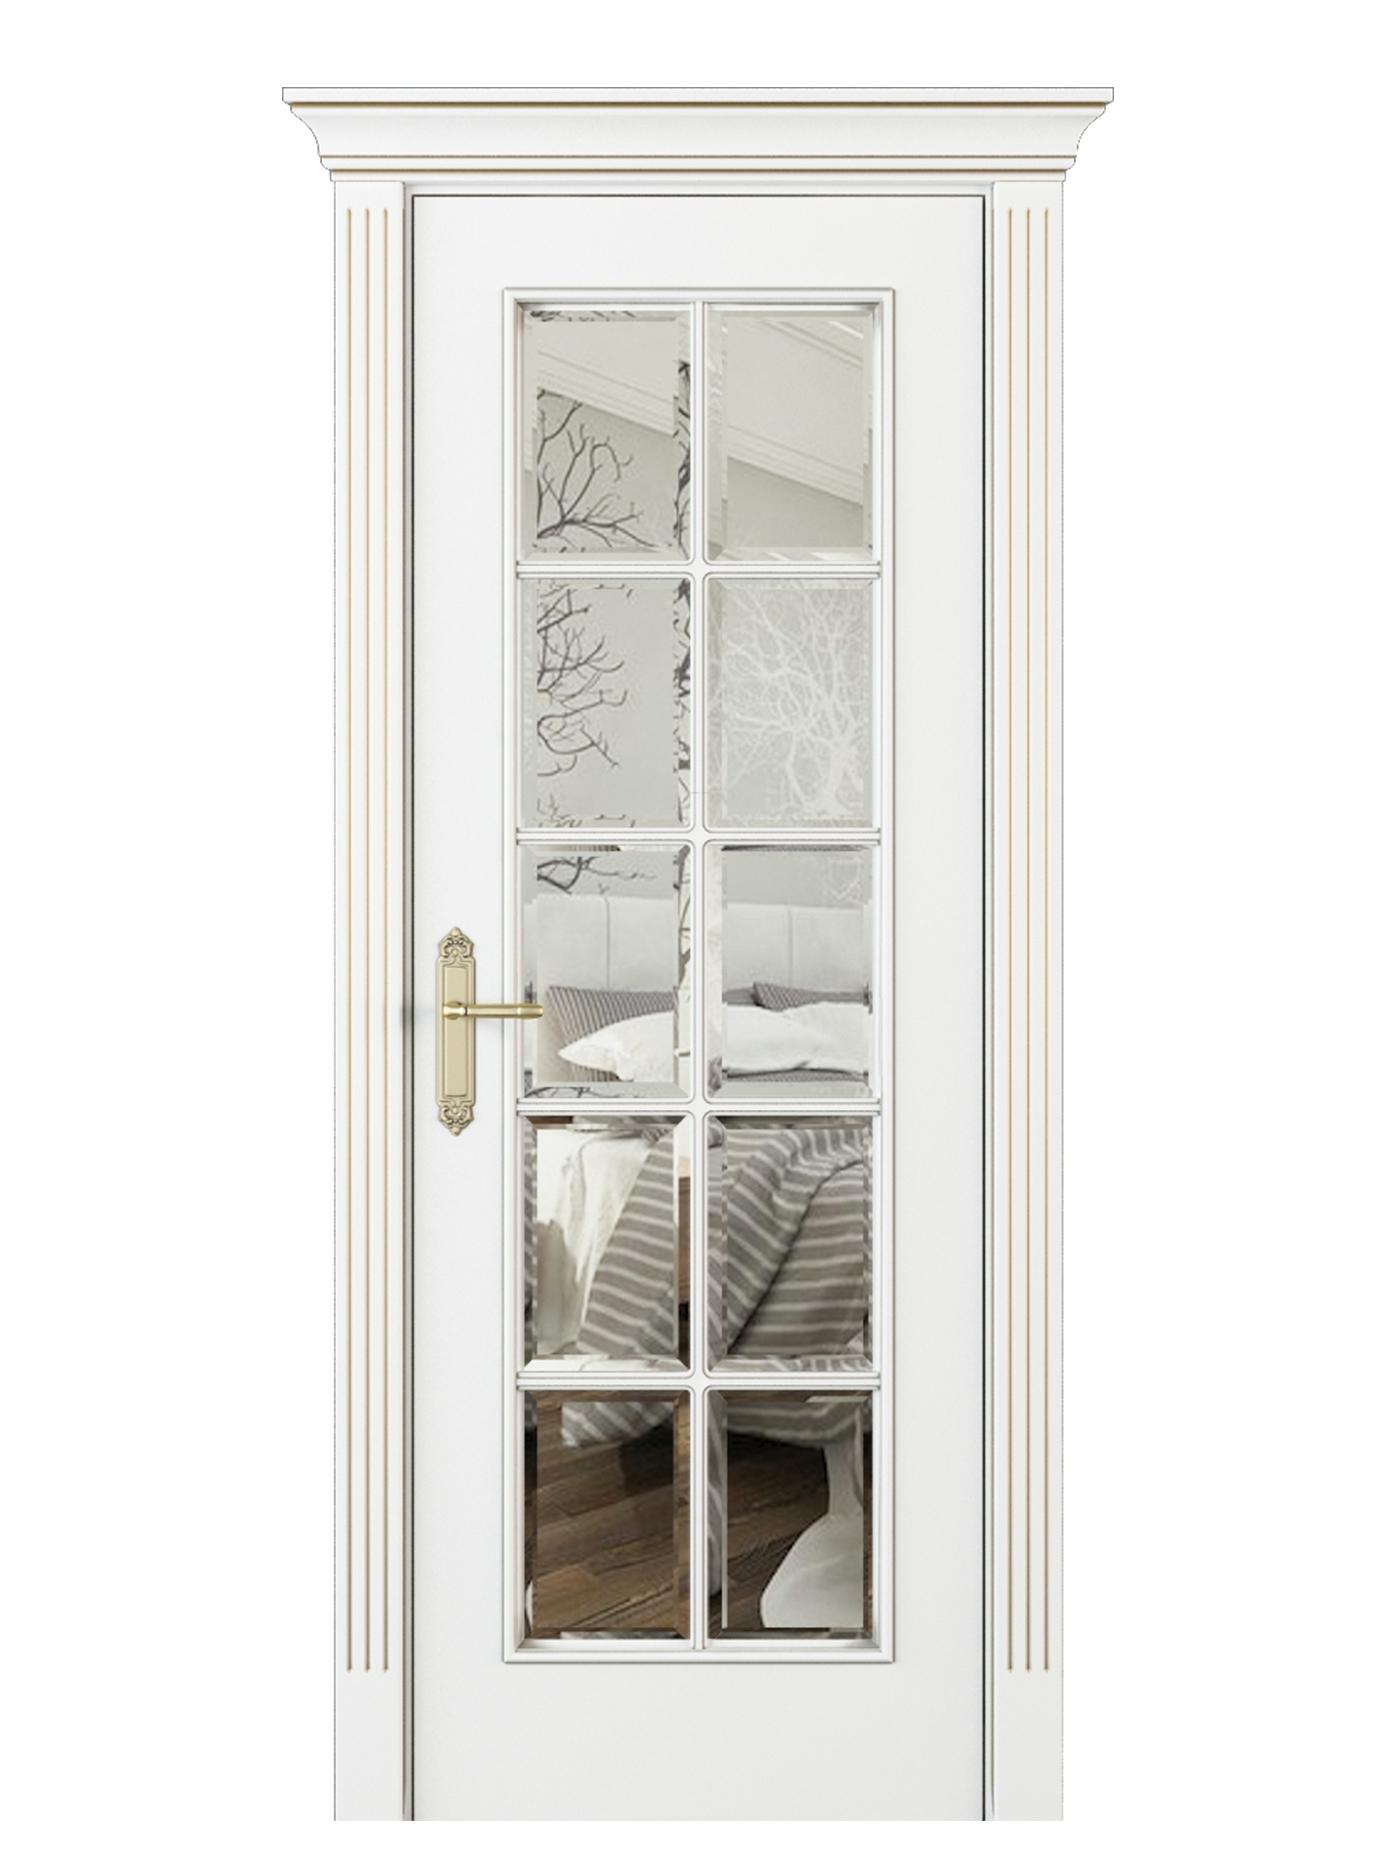 Image Parma Interior Door Italian Enamel White Beveled Glass 0